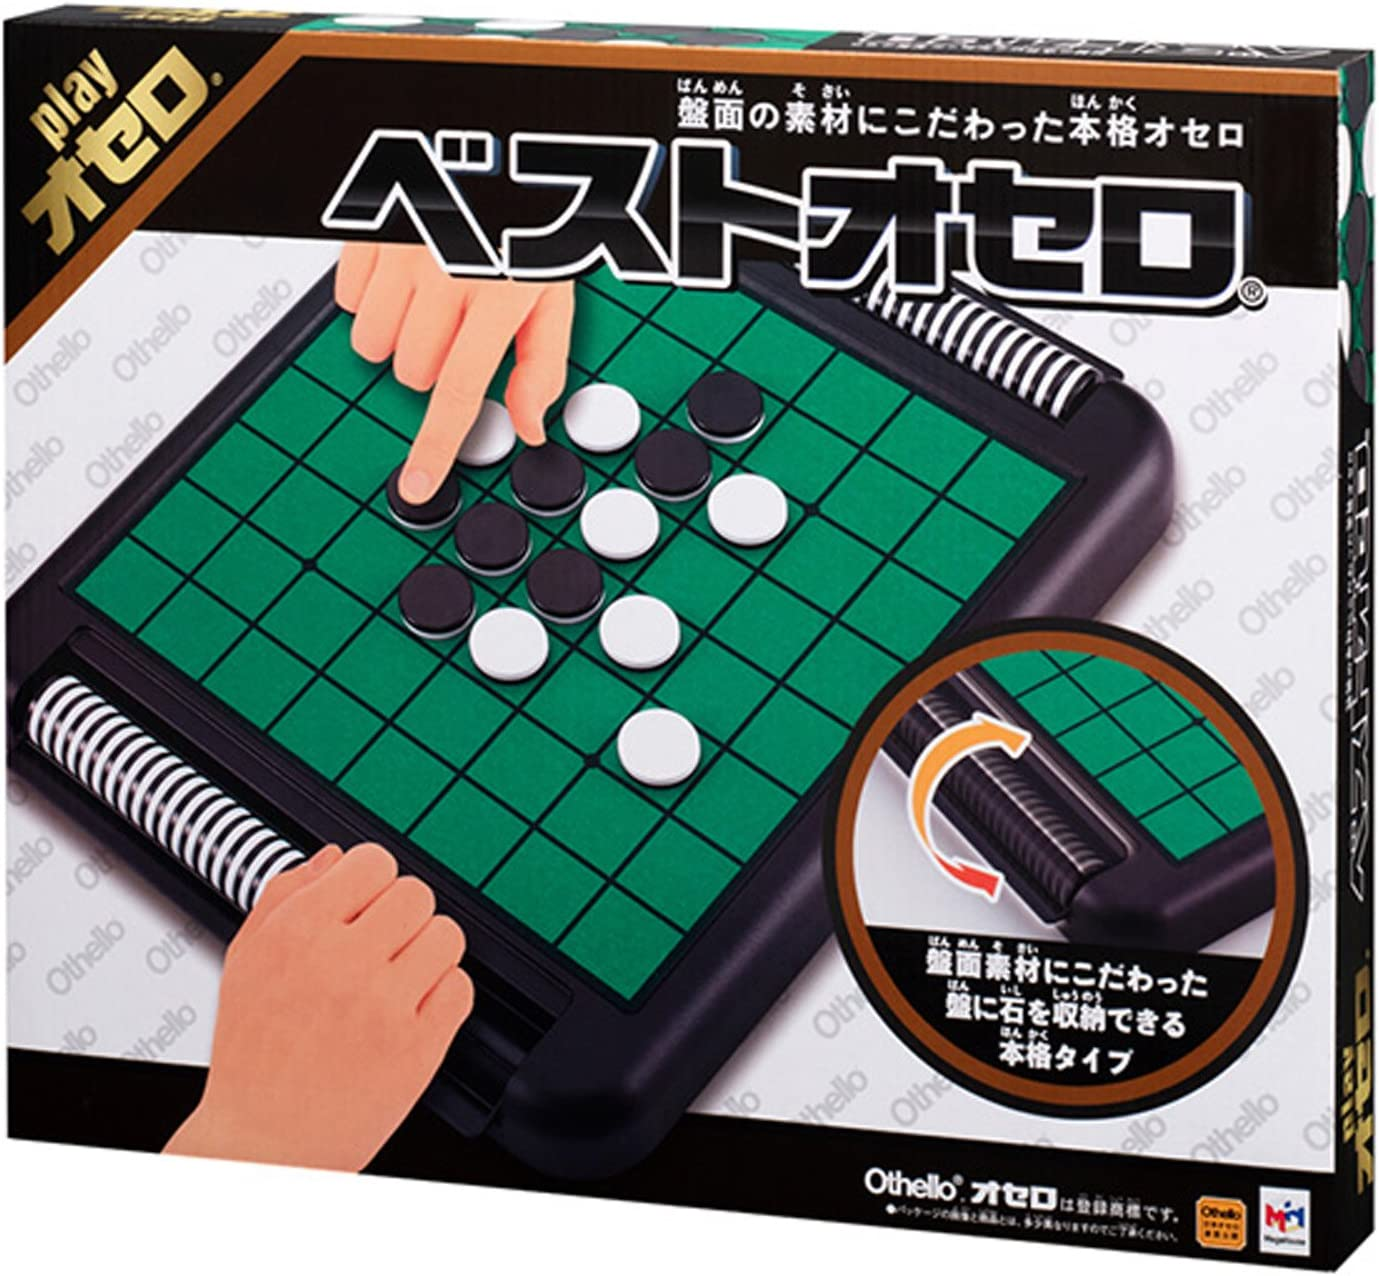 Best Othello by Mega House (Japan Import) (japan import): Amazon.es: Juguetes y juegos